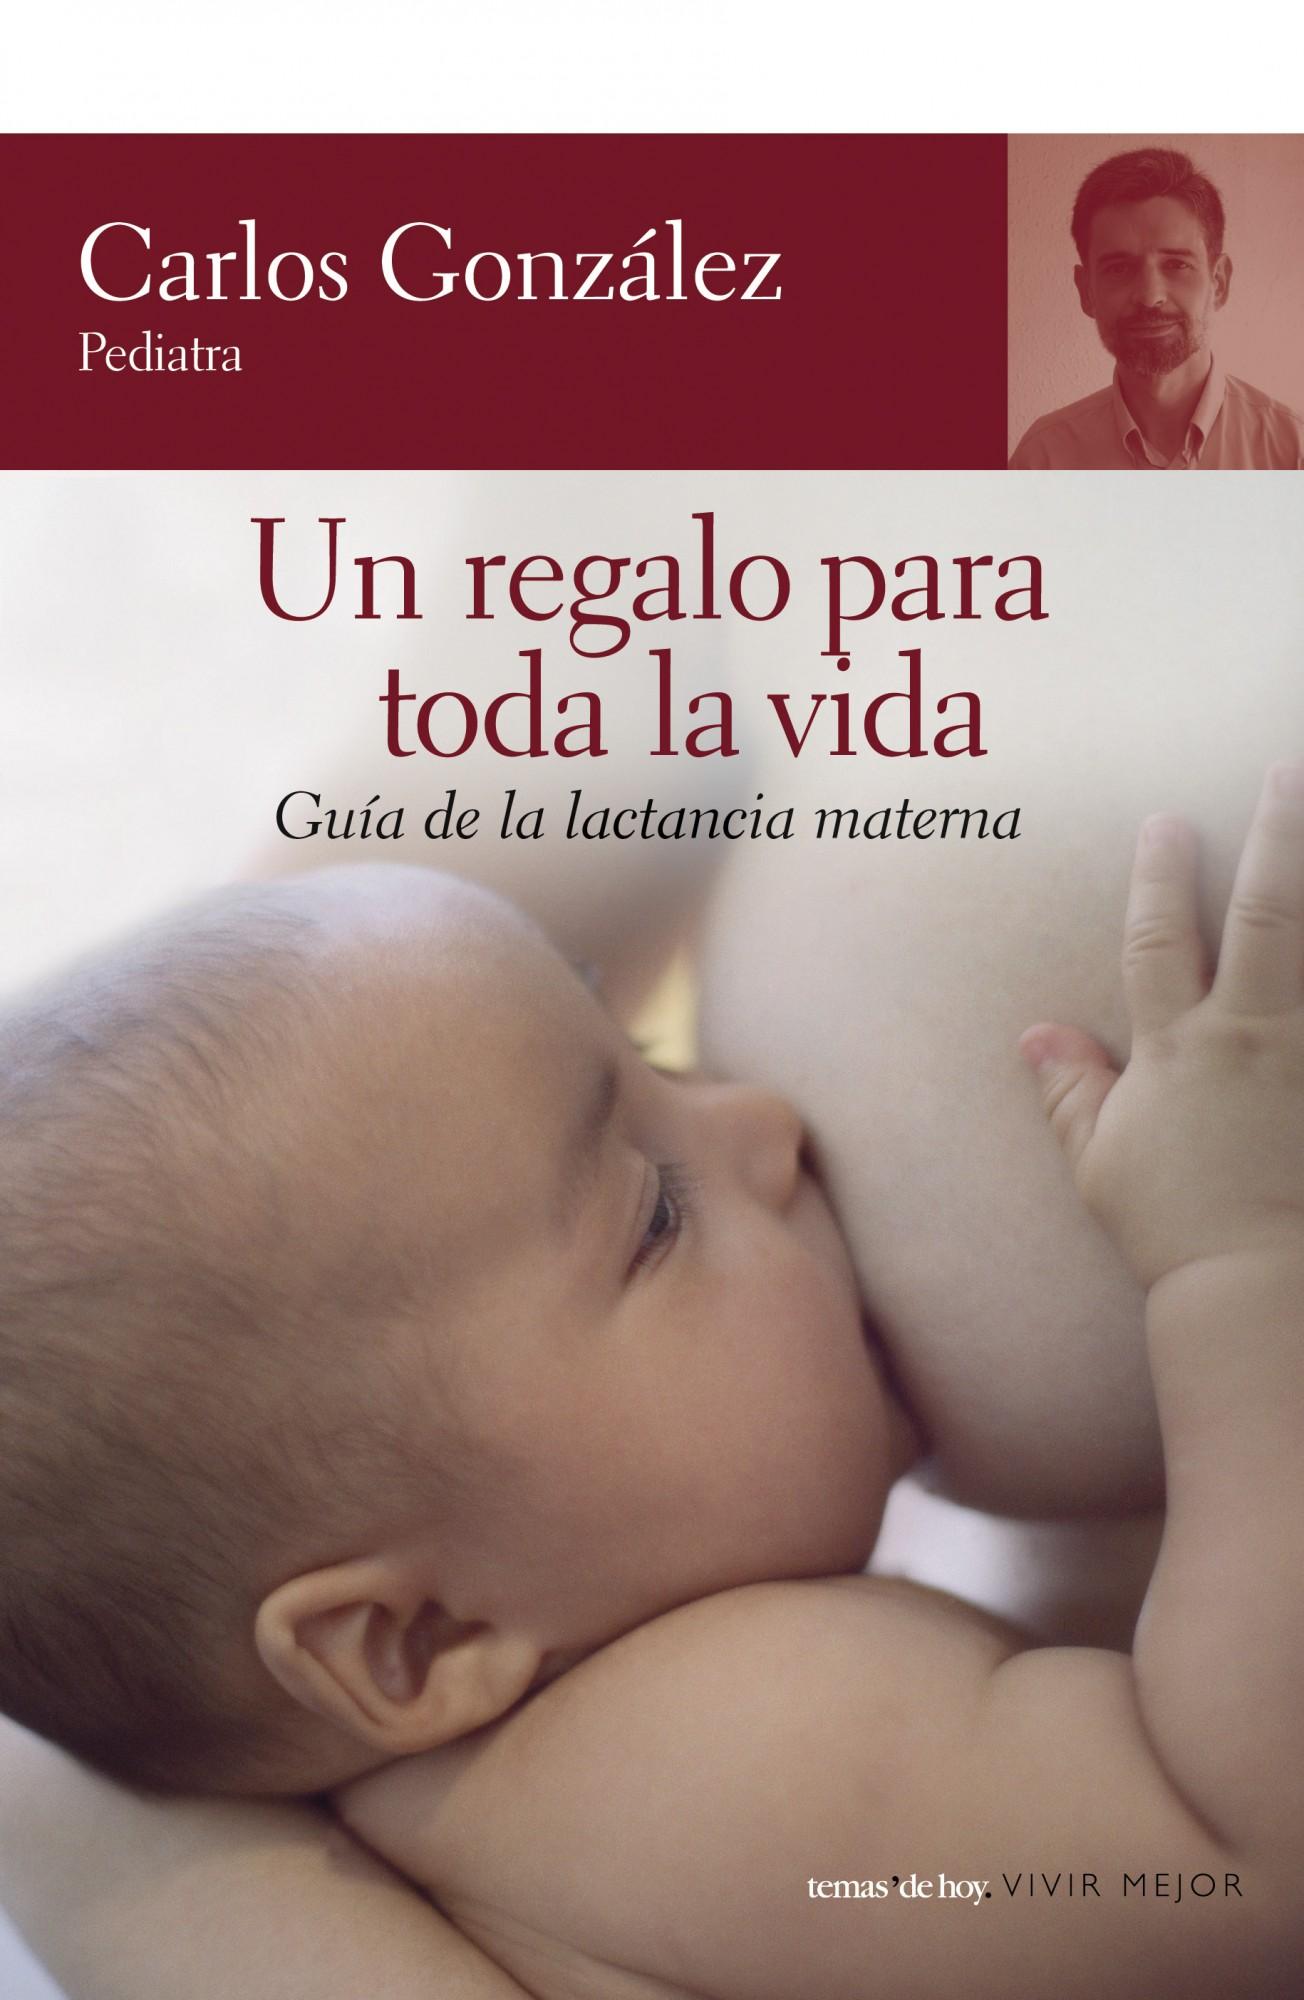 Un Regalo Para Toda La Vida: Guia De La Lactancia Materna - Gonzalez Carlos